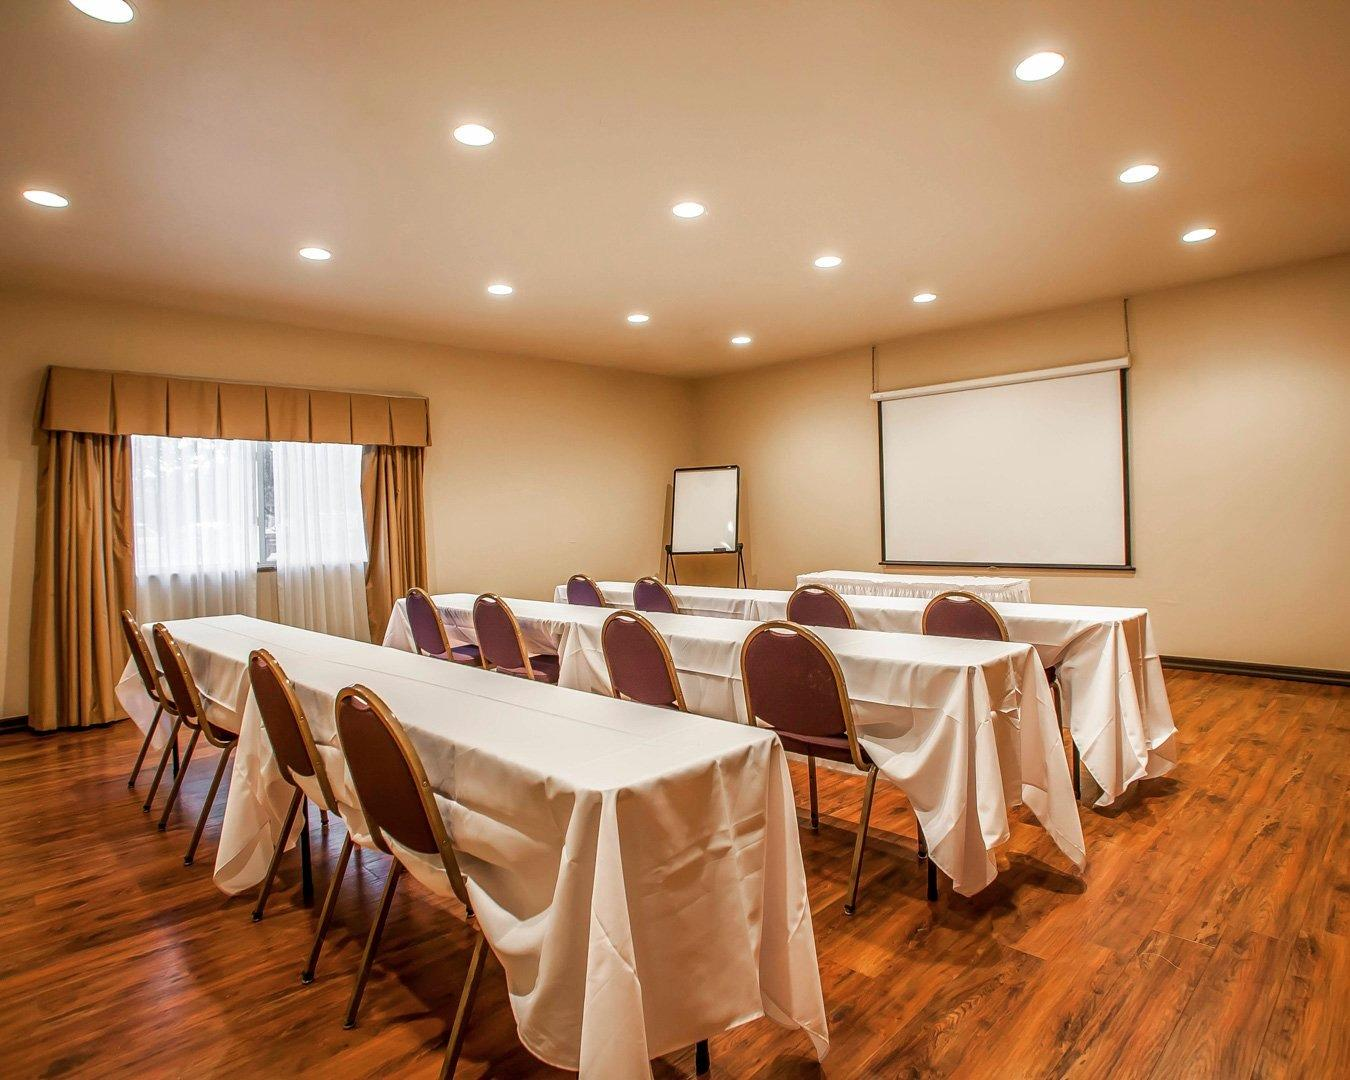 Quality Inn & Suites, Hannibal MO